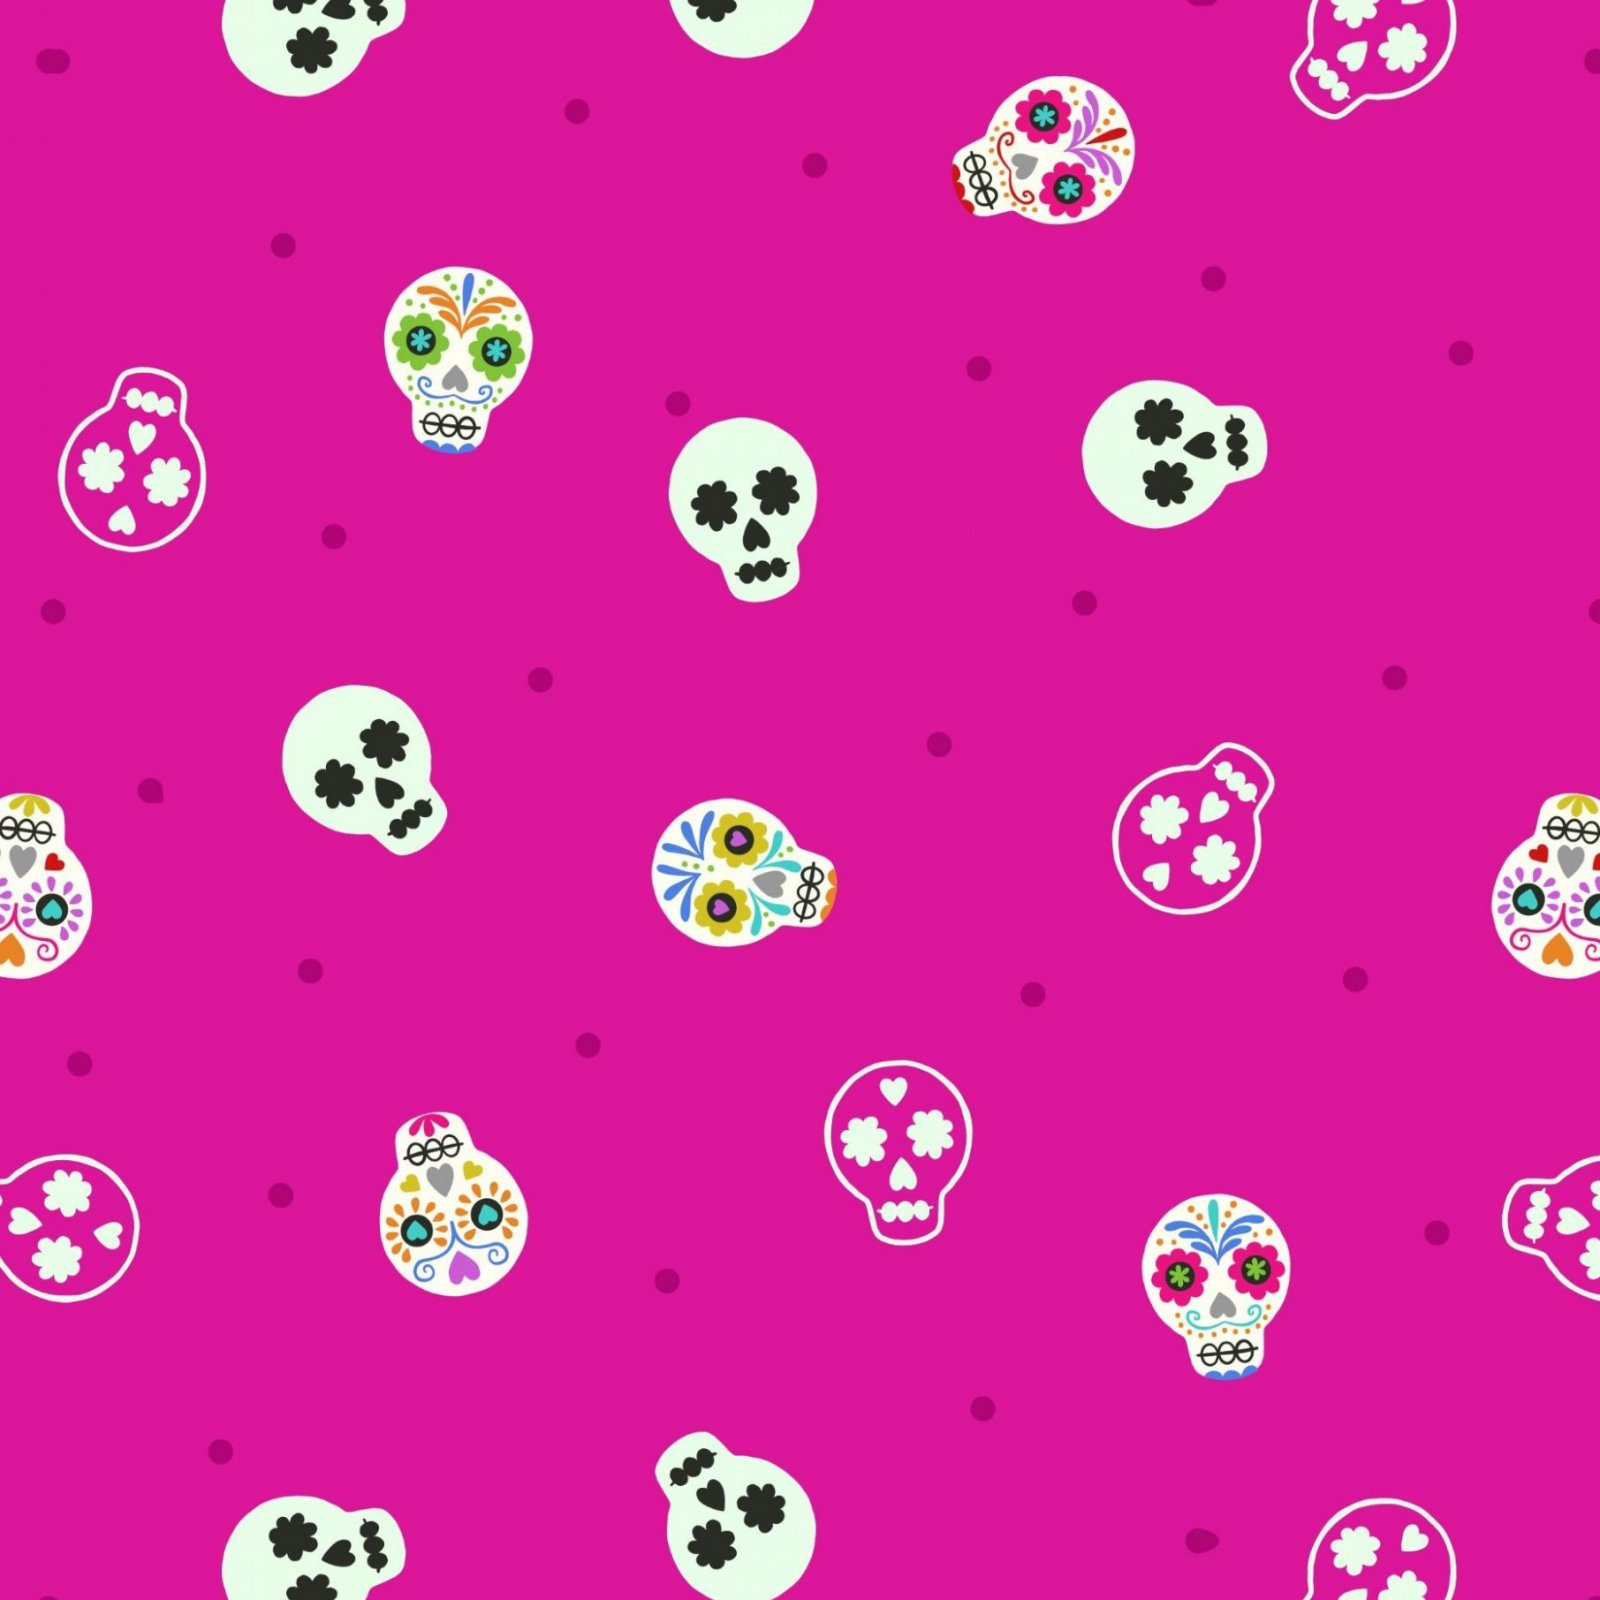 Lewis & Irene Small Things Sugar Skulls - Bright Pink (Glow In The Dark)